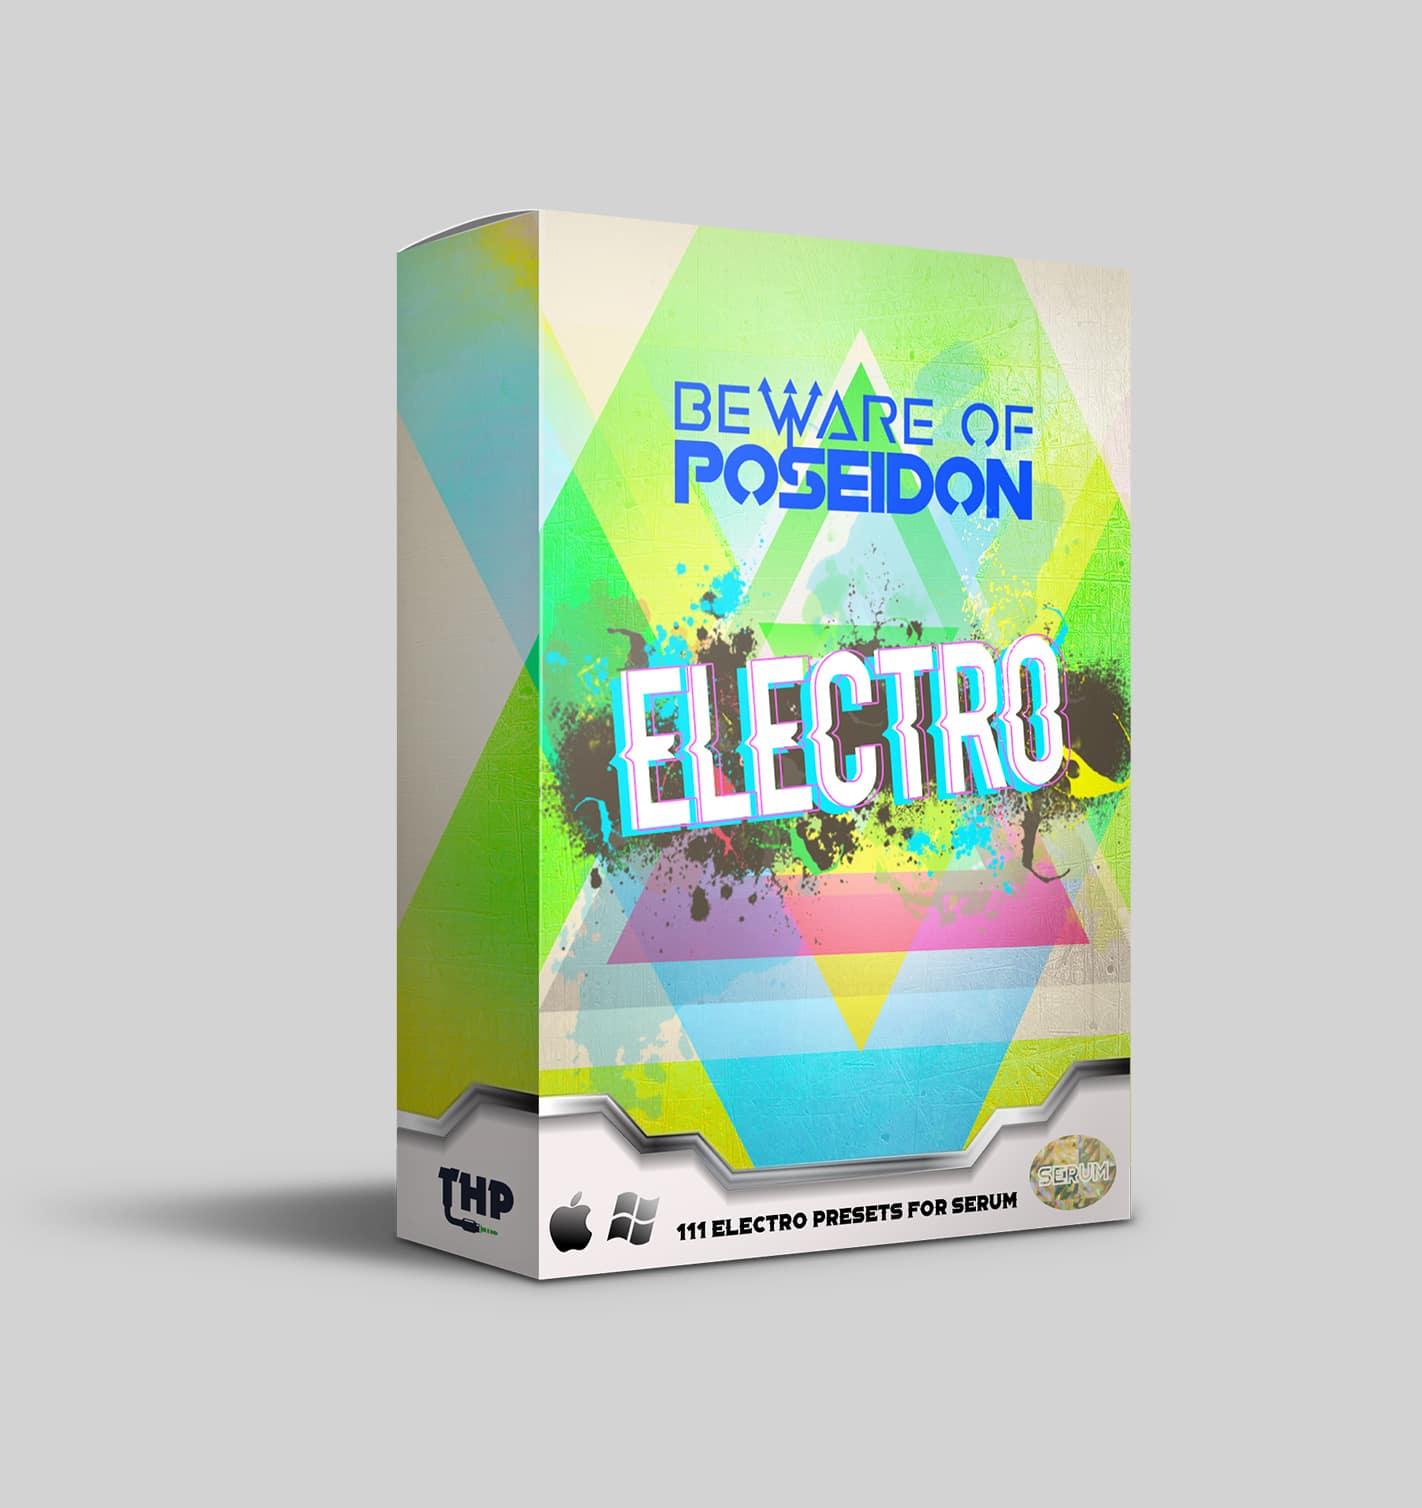 Beware of Poseidon Electro Presets for Serum